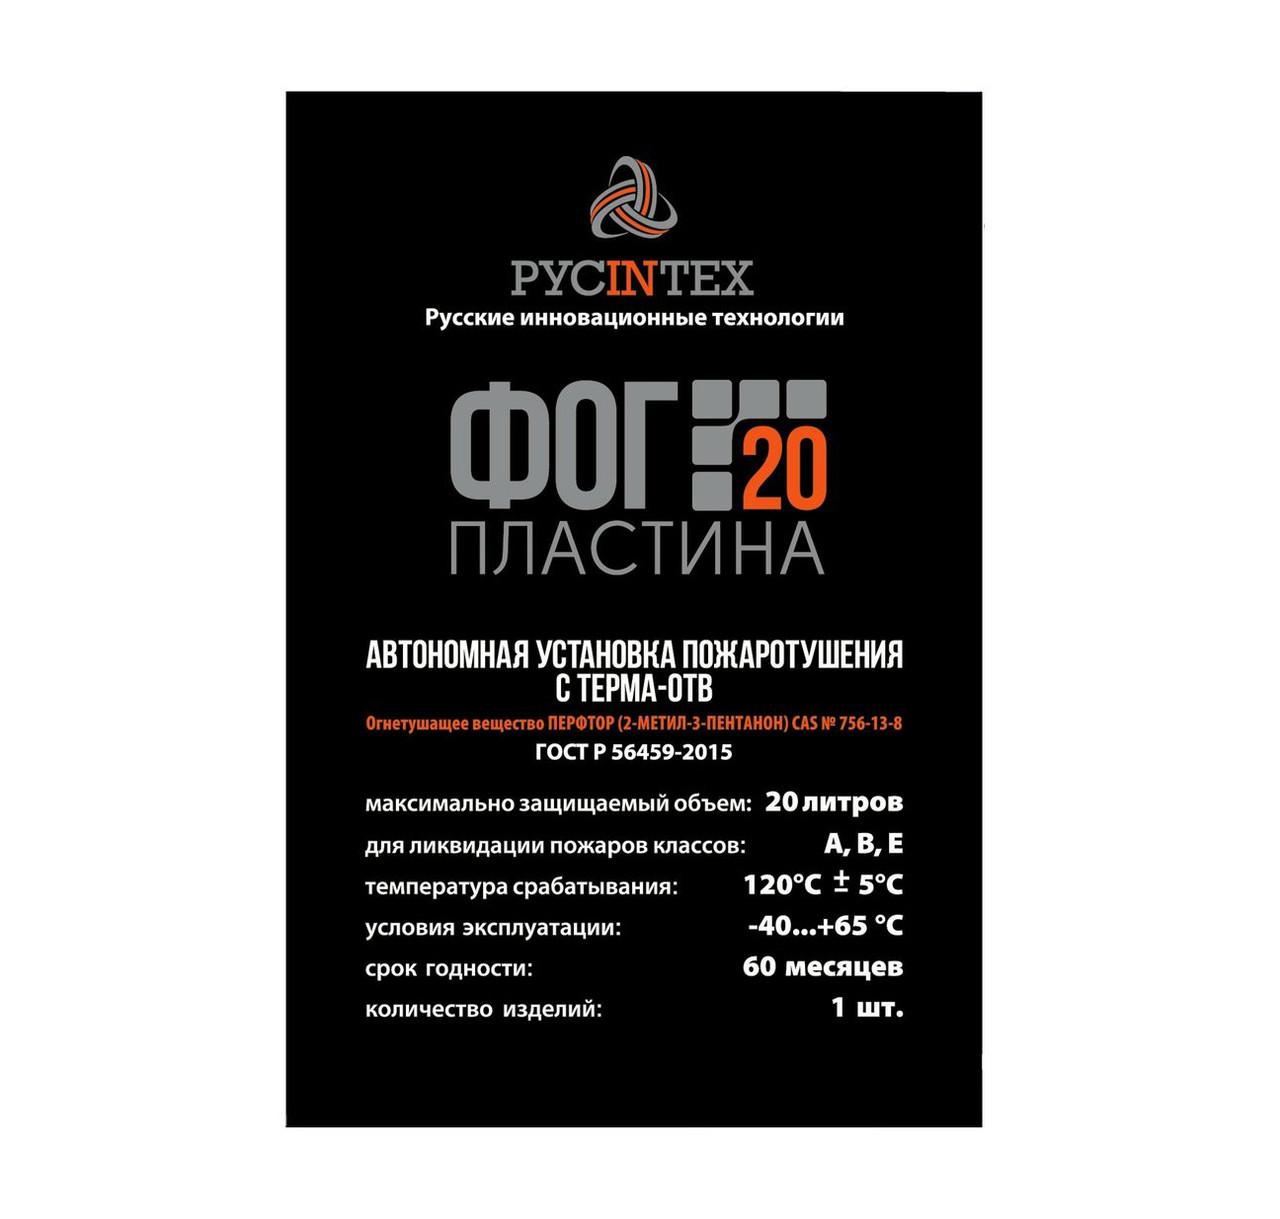 Пиростикер автономный ФОГ Пластина 20